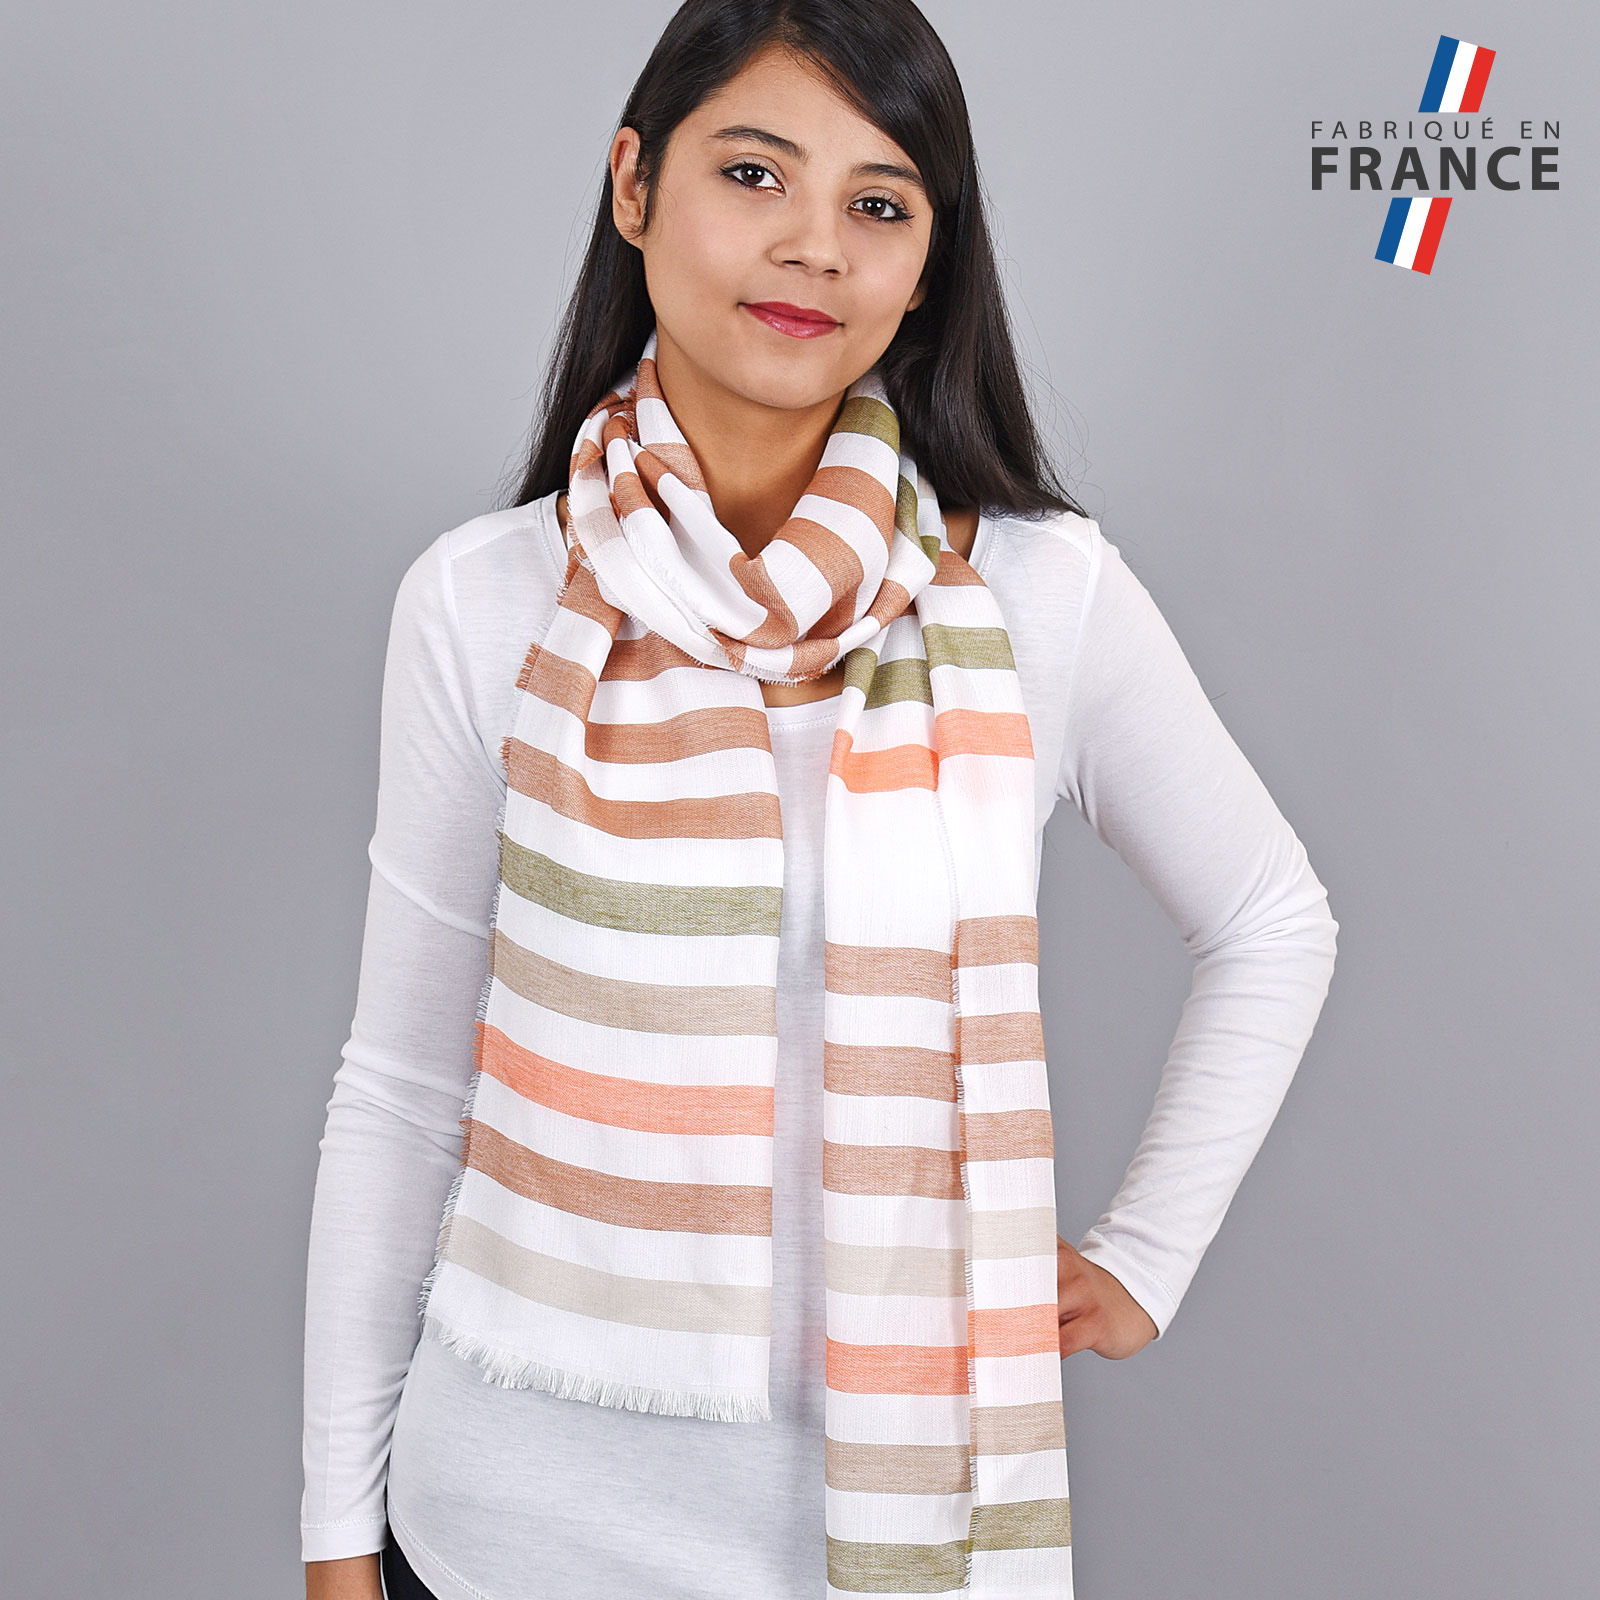 AT-04296-VF16-LB_FR-echarpe-legere-orange-marron-rayures